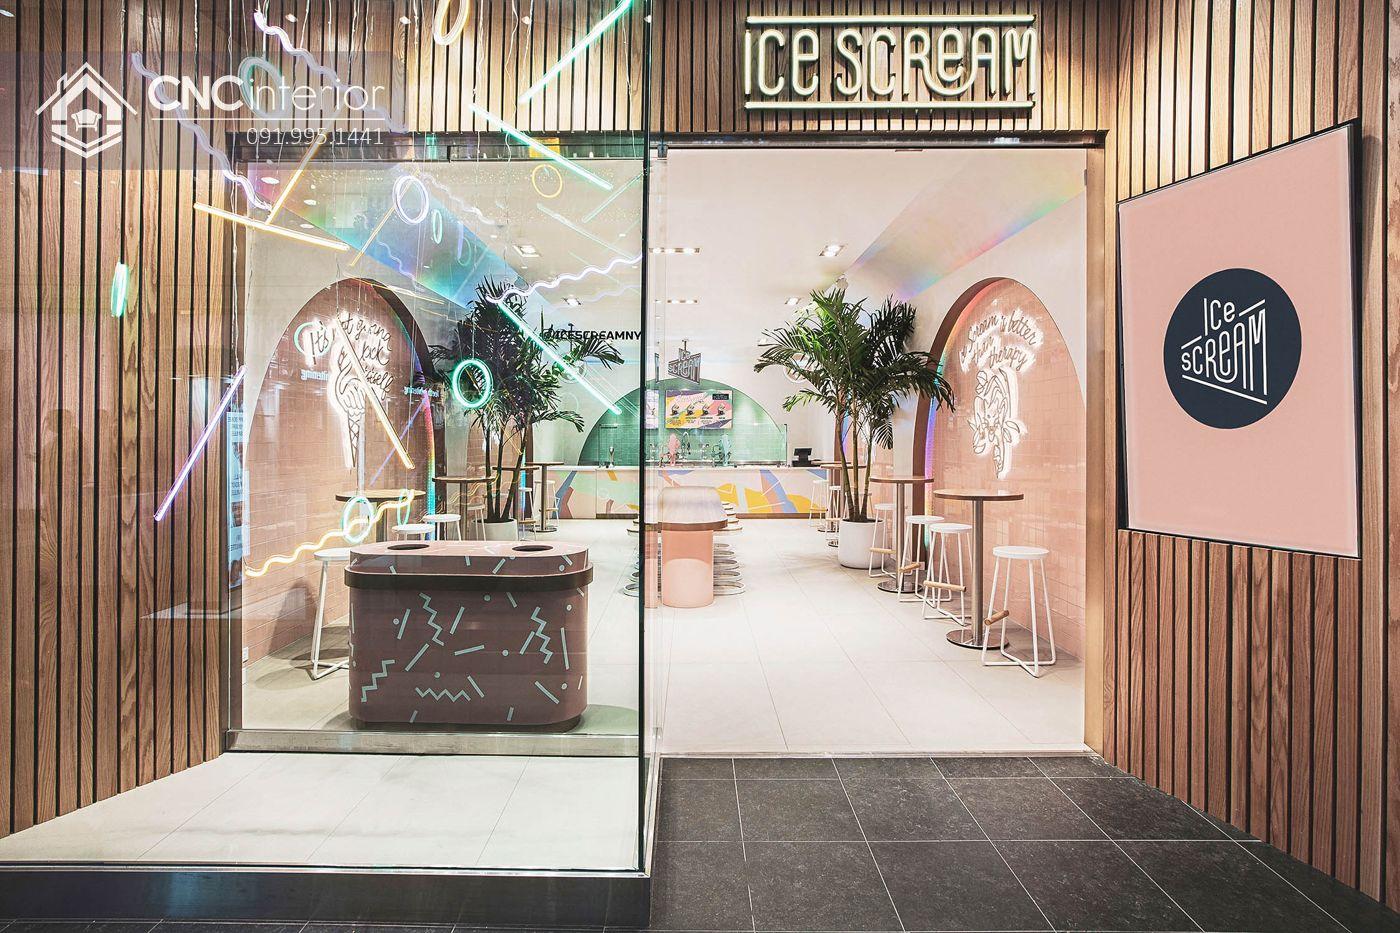 Quán kem Ice Dream phong cách Neo-Memphis